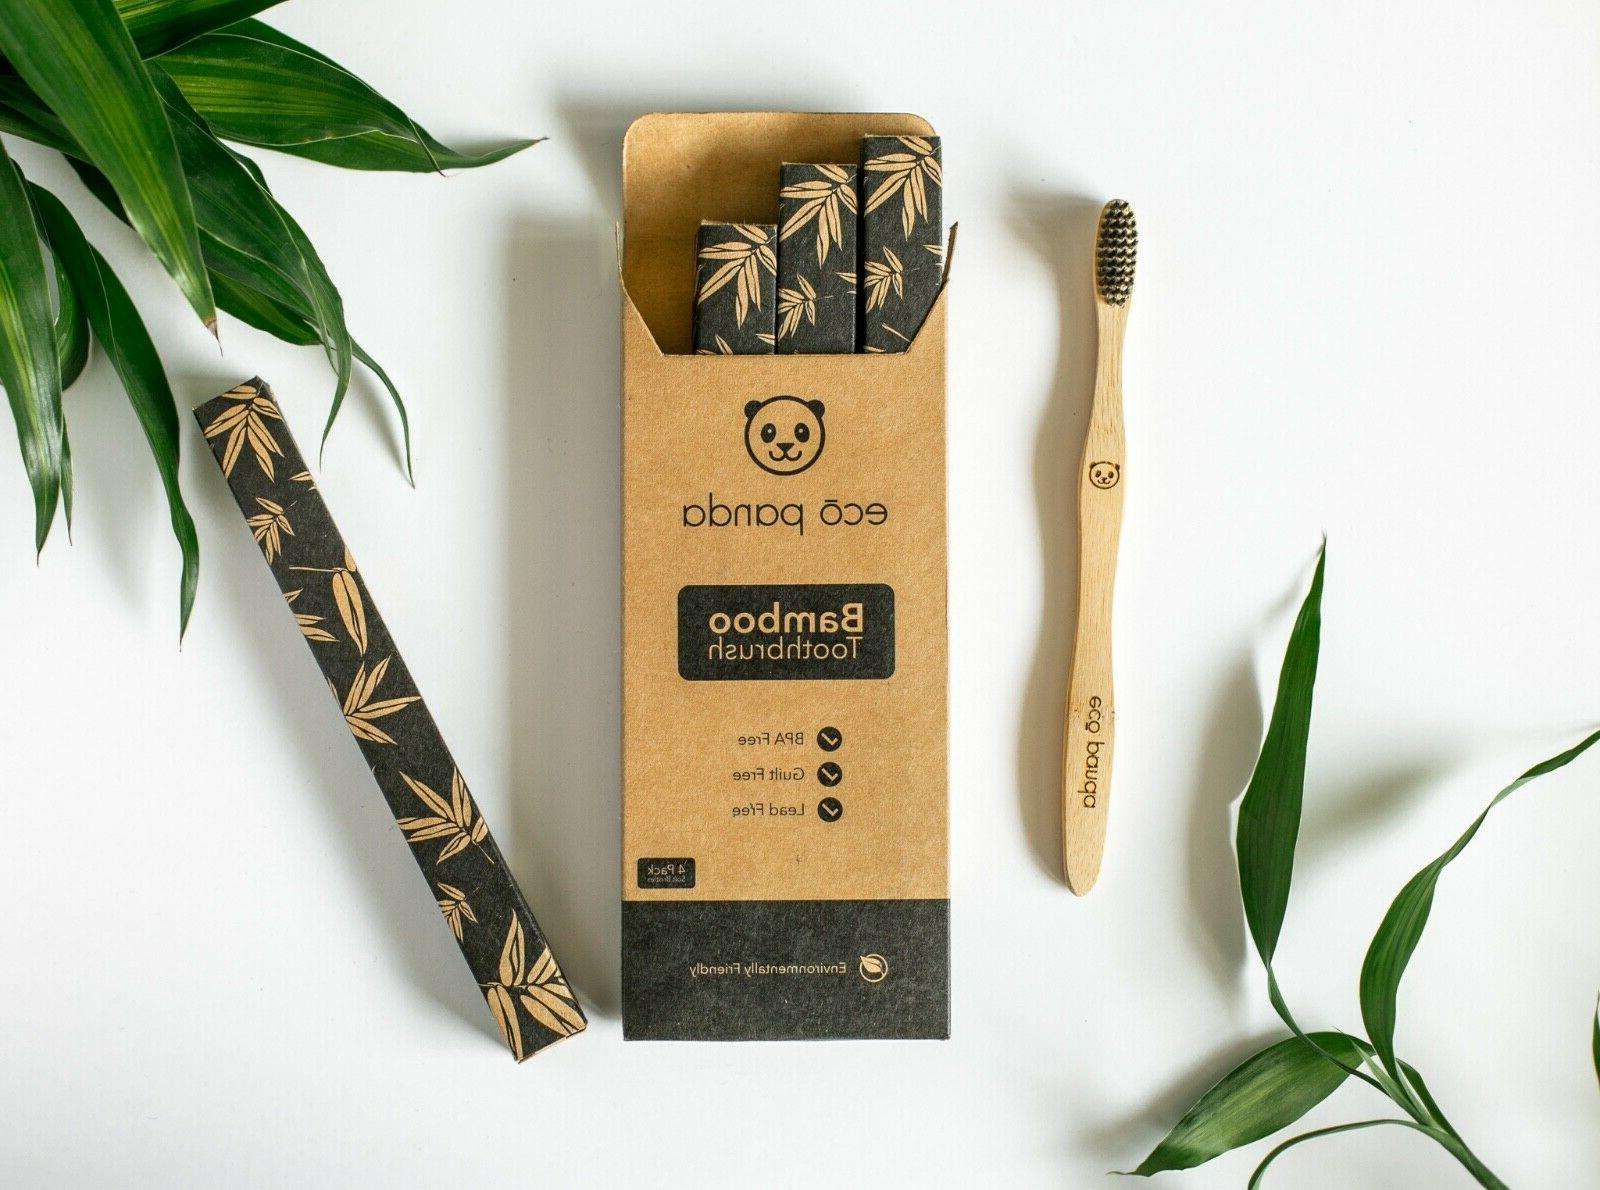 natural bamboo toothbrush 4 pack adult vegan